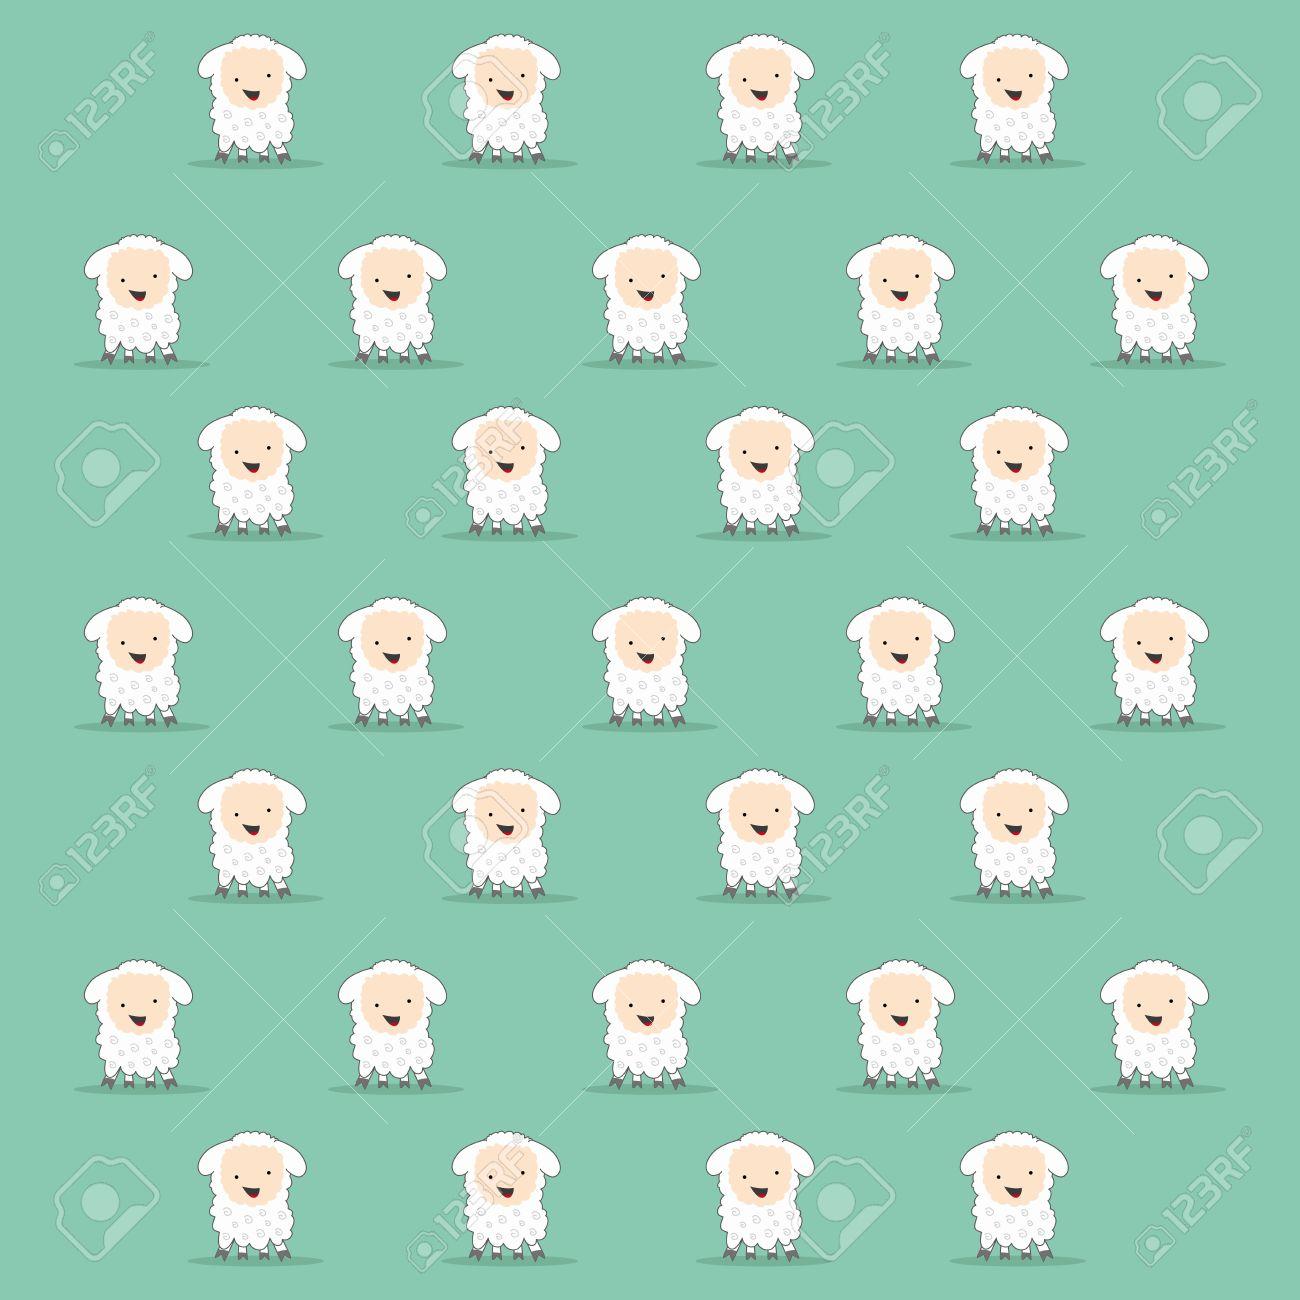 Cute Cartoon Sheep Texture In Green Stock Vector